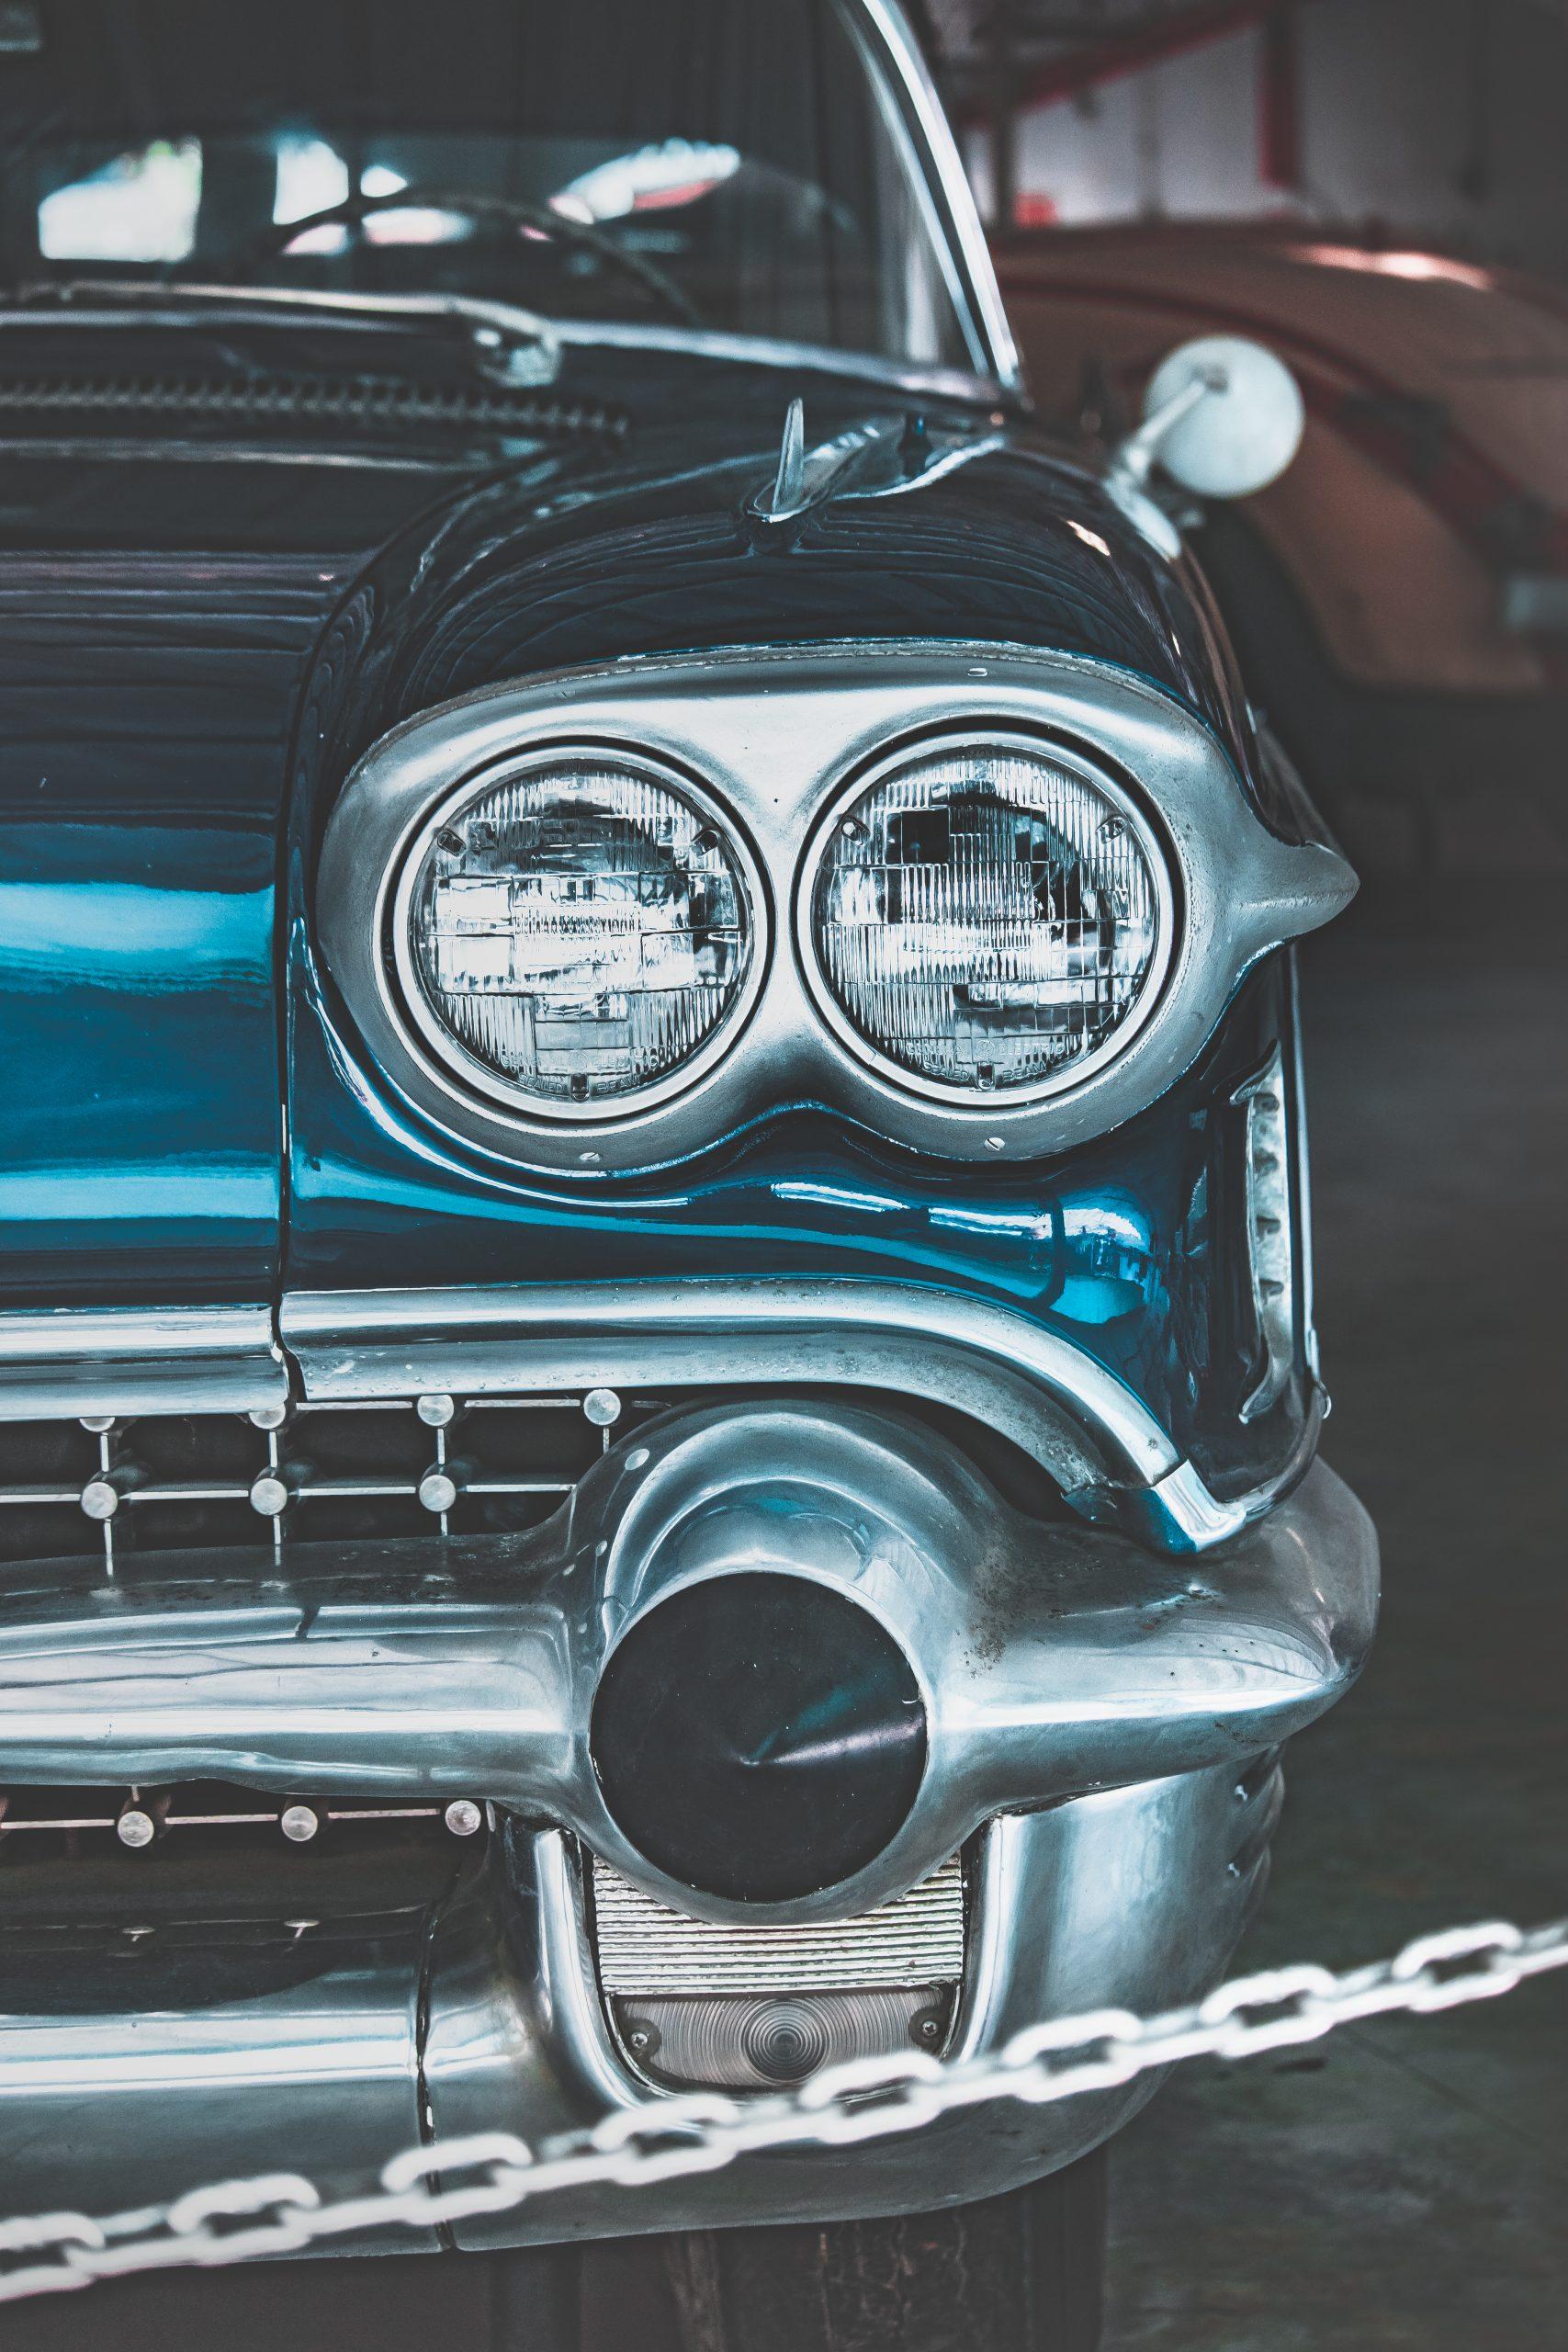 Cadillac Fleetwood car